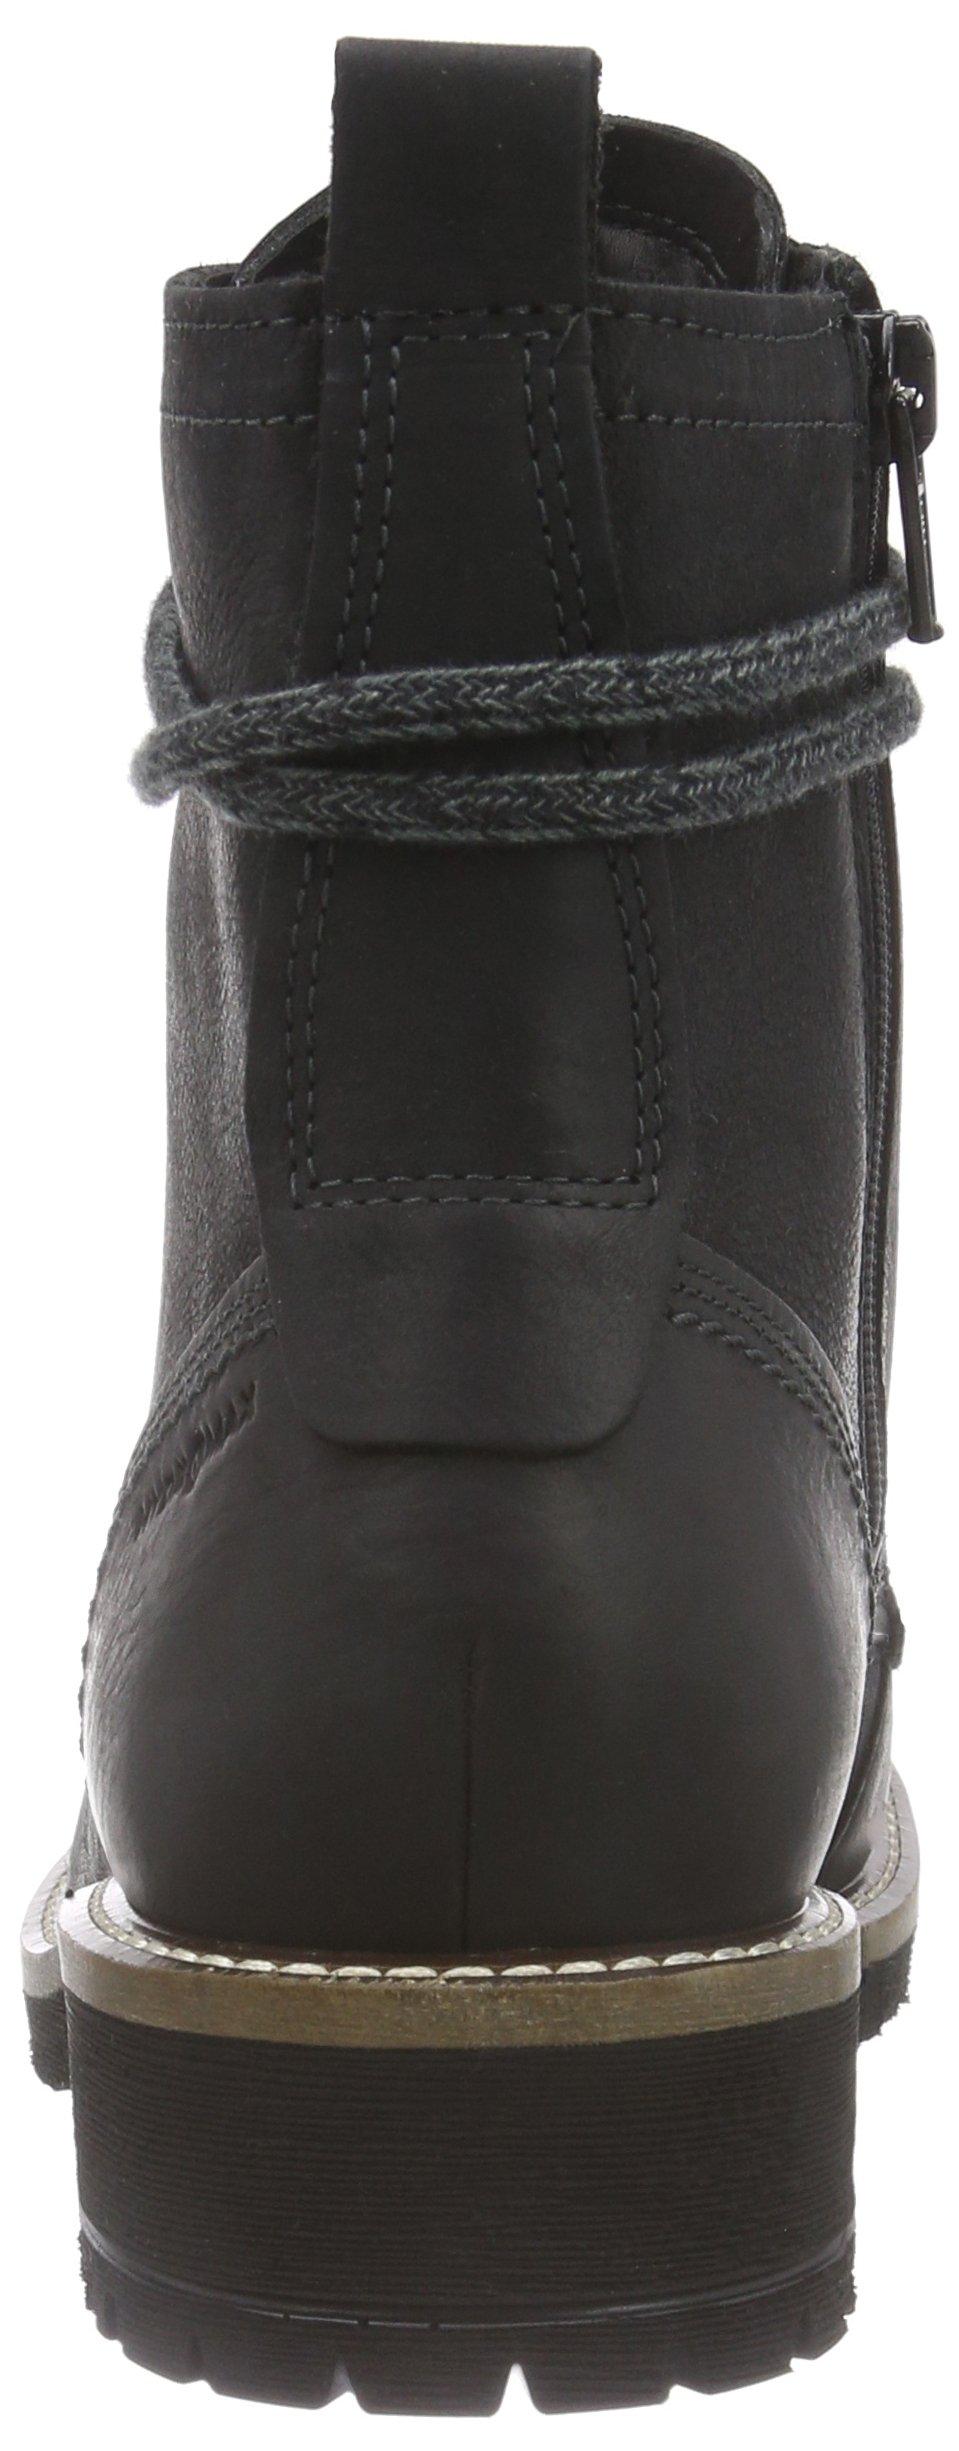 Ecco Footwear Womens Elaine Boot, Black, 37 EU/6-6.5 M US by ECCO (Image #2)